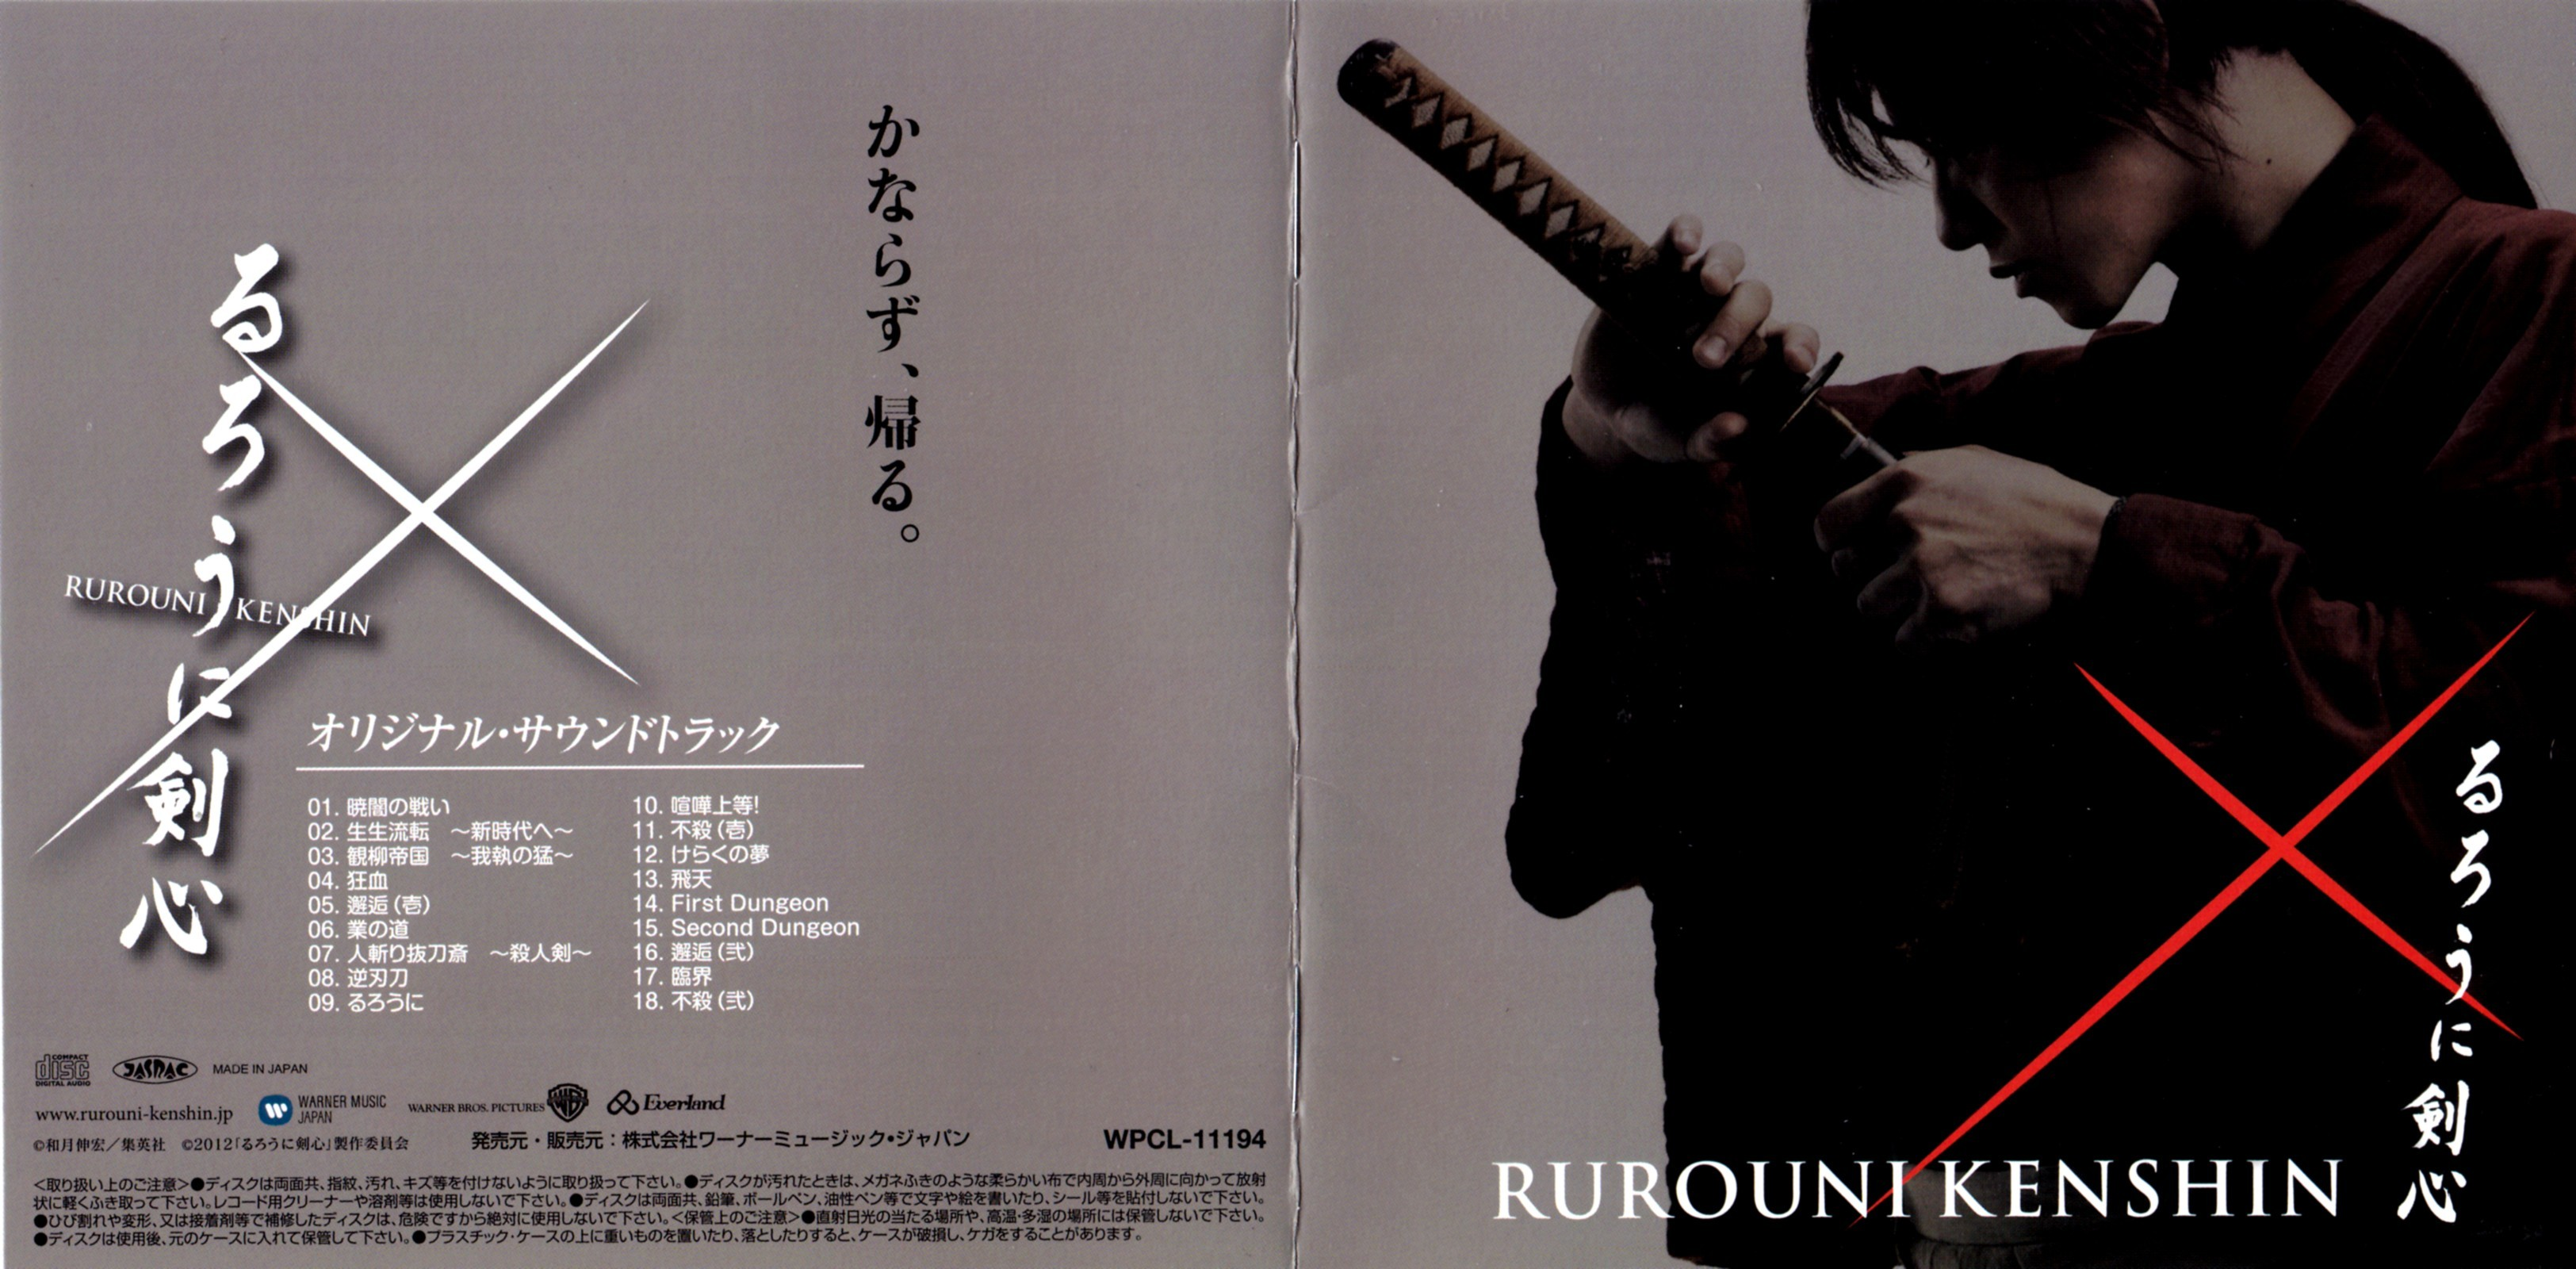 Rurouni Kenshin Live Action Movie Original Soundtrack